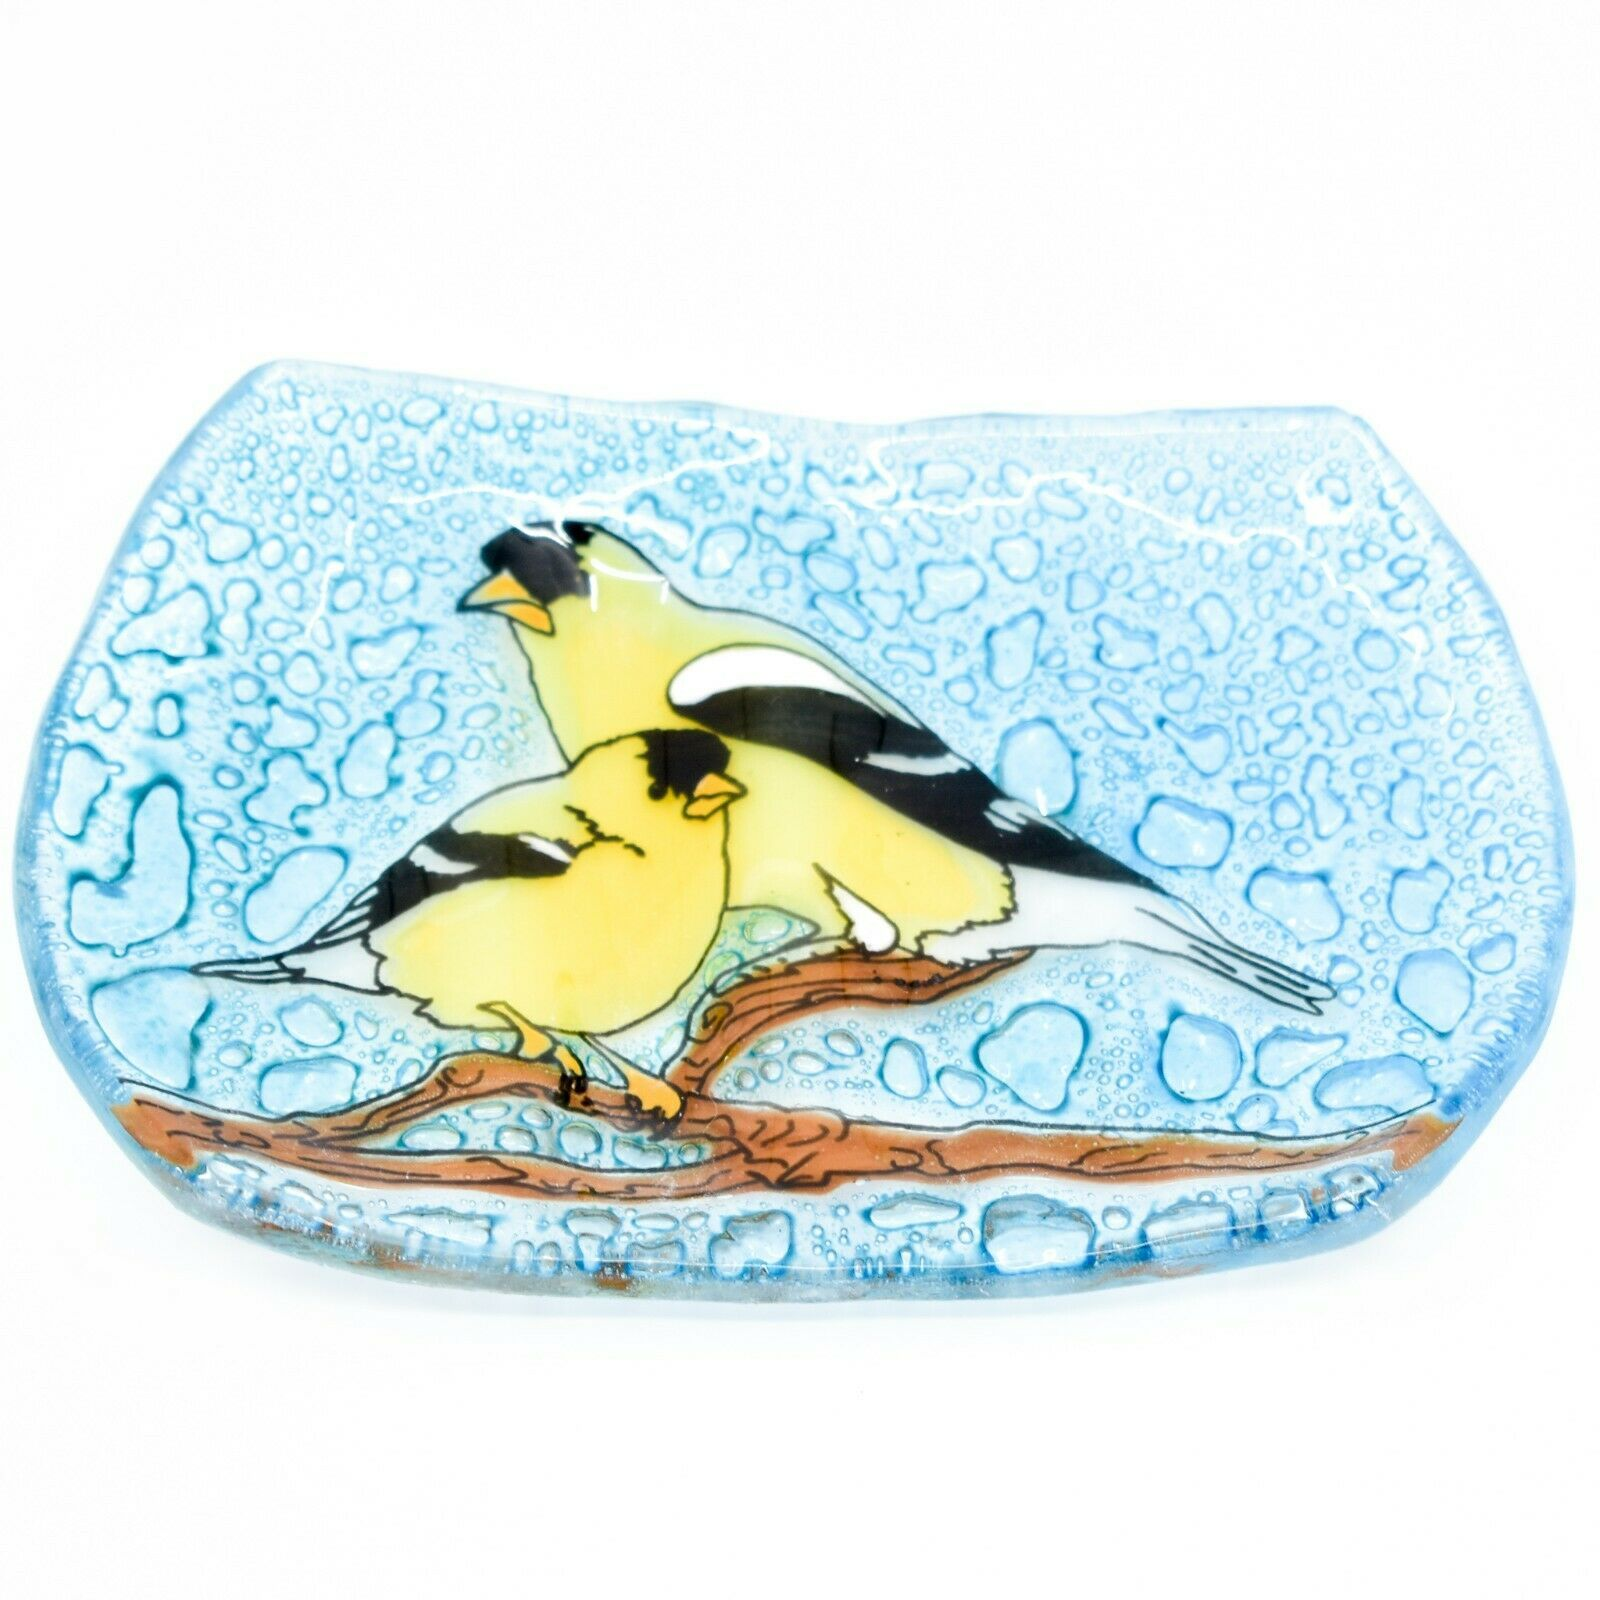 Fused Art Glass Goldfinch Yellow Finch Bird Design Soap Dish Handmade Ecuador